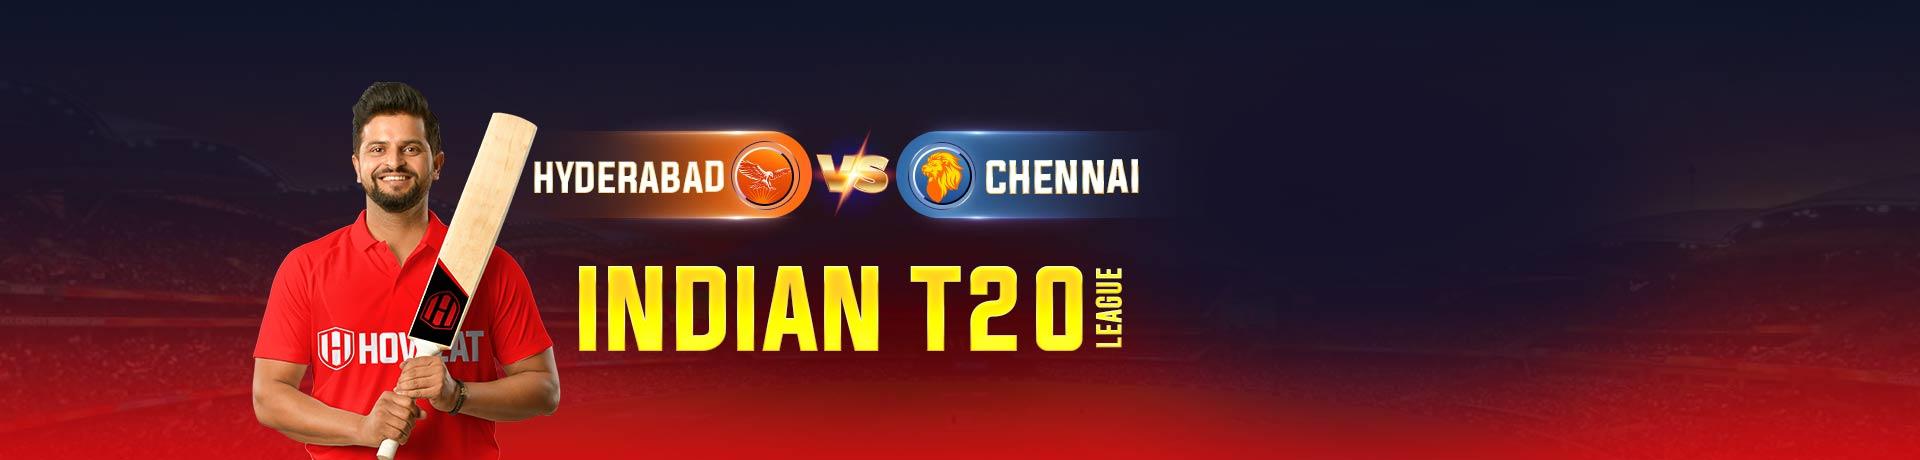 Hyderabad vs Chennai Indian T20 League